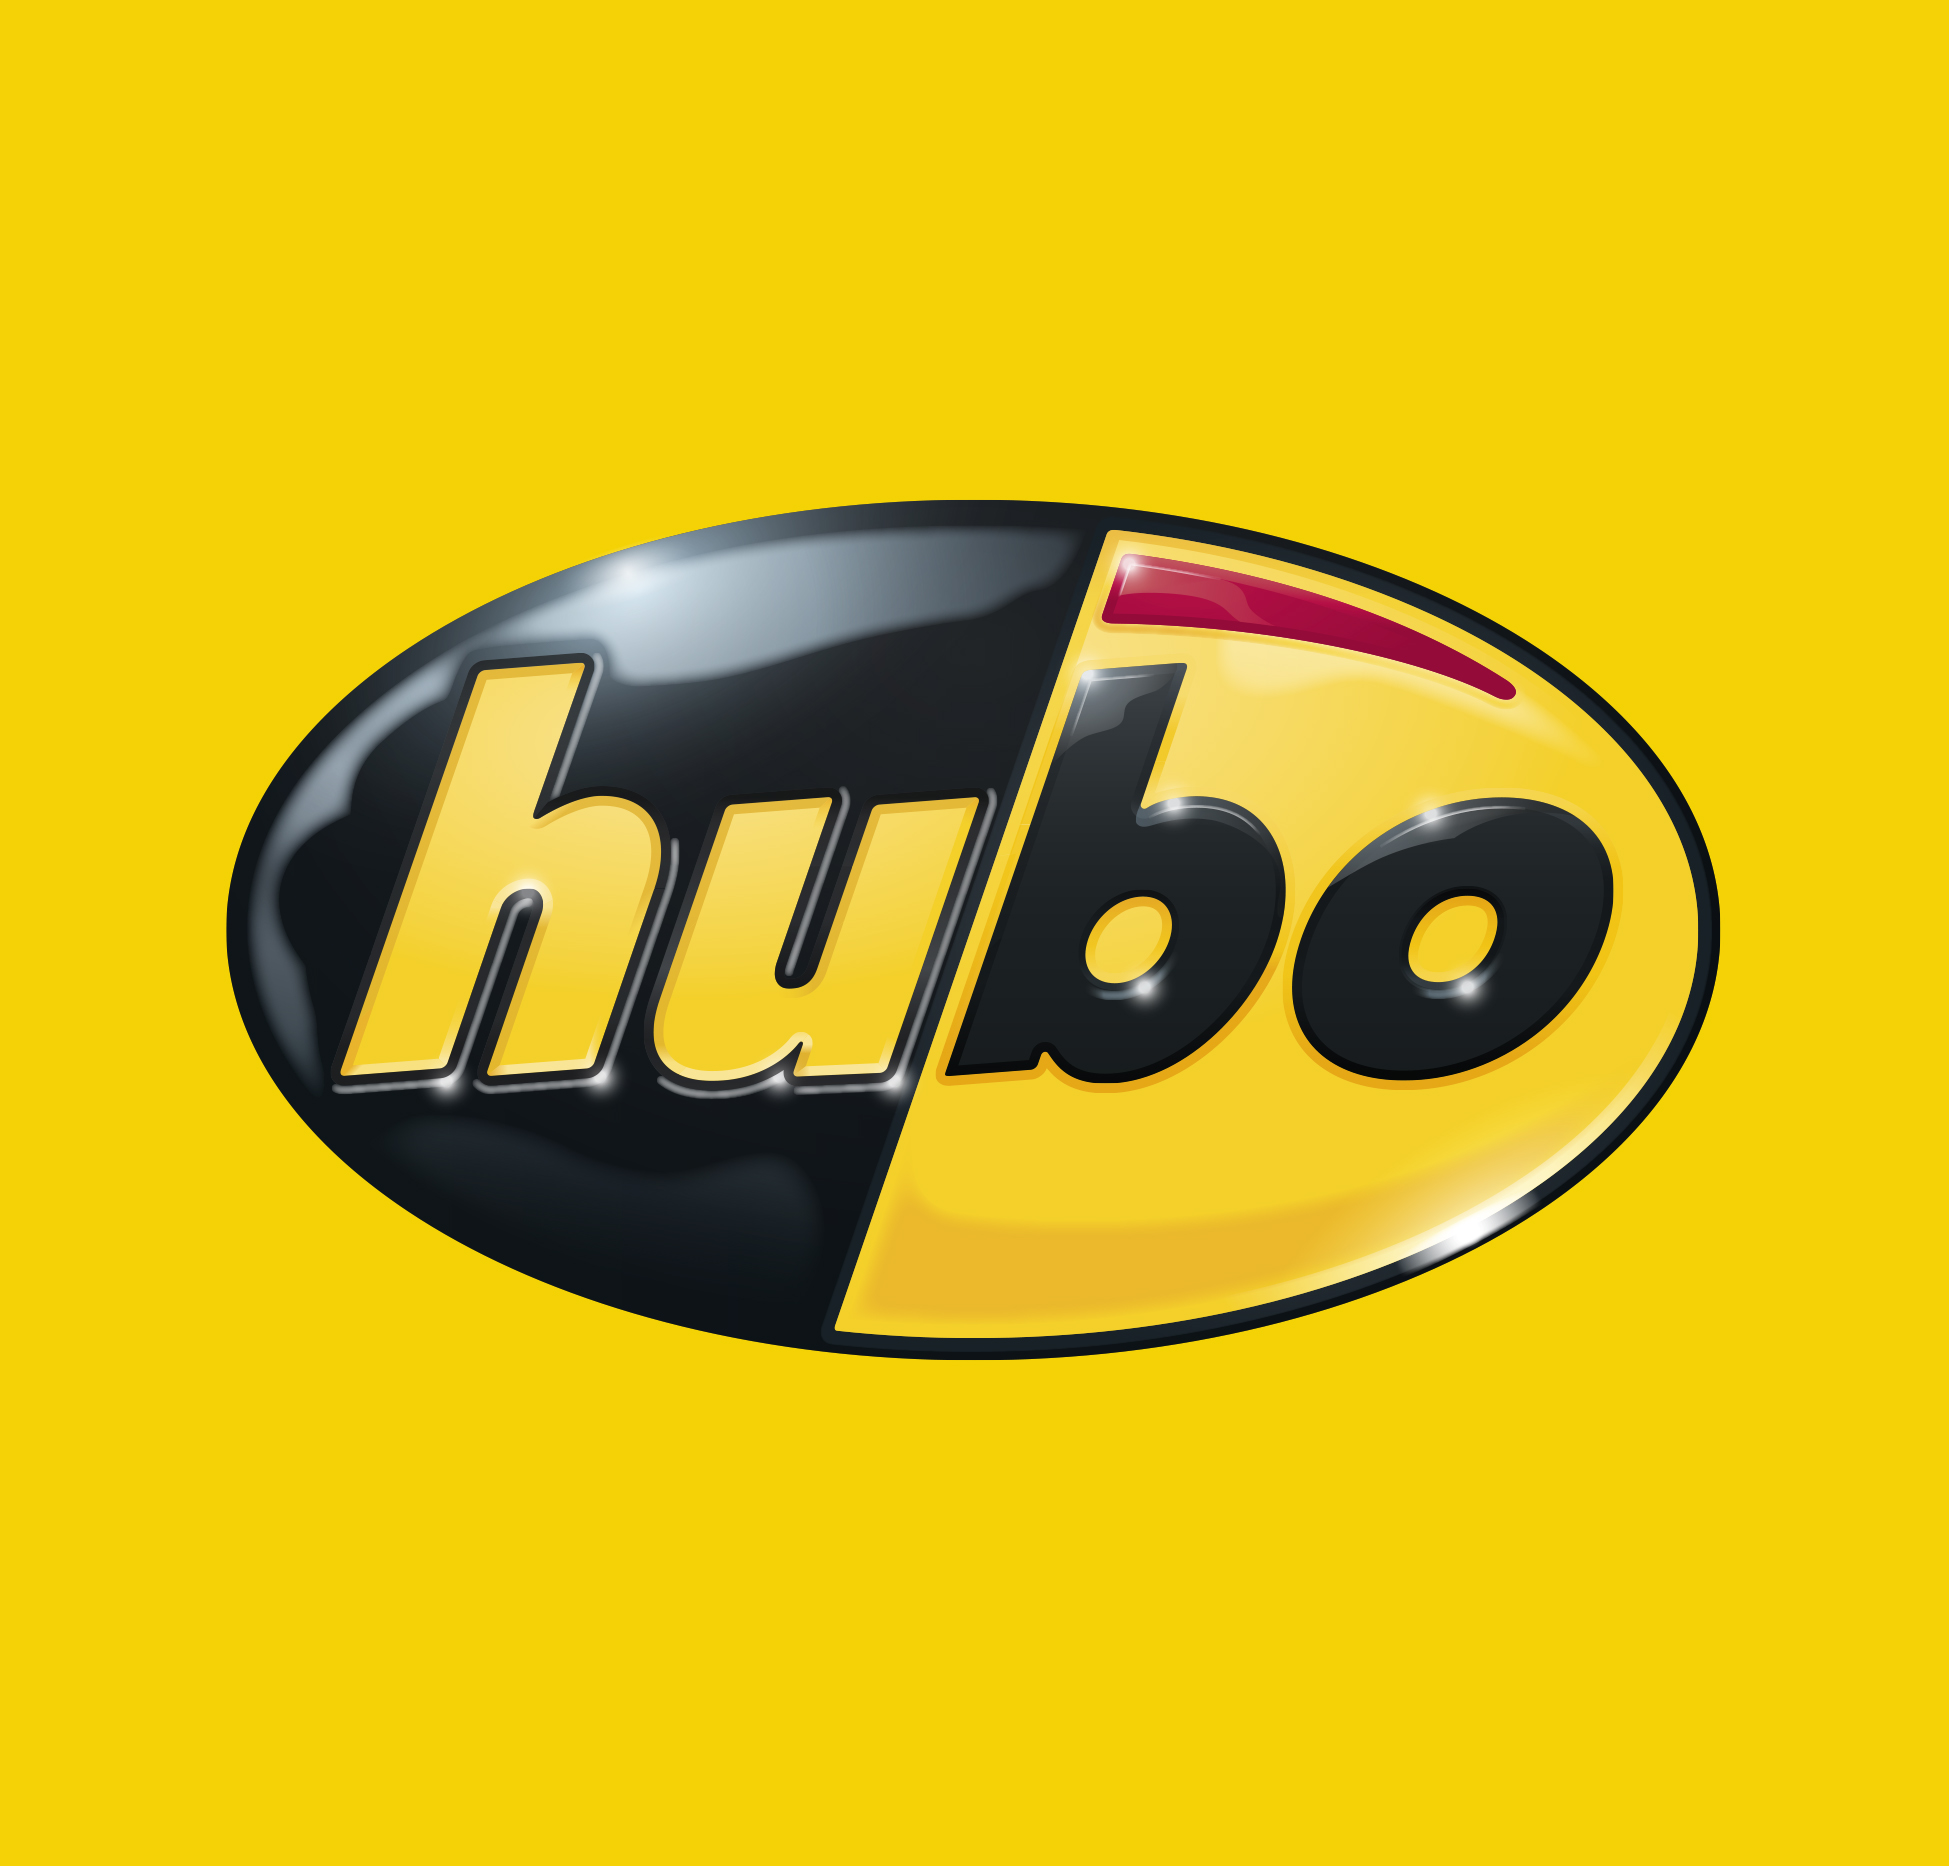 20170313&071330_Badkamer Verwarming Hubo – Brigee.com